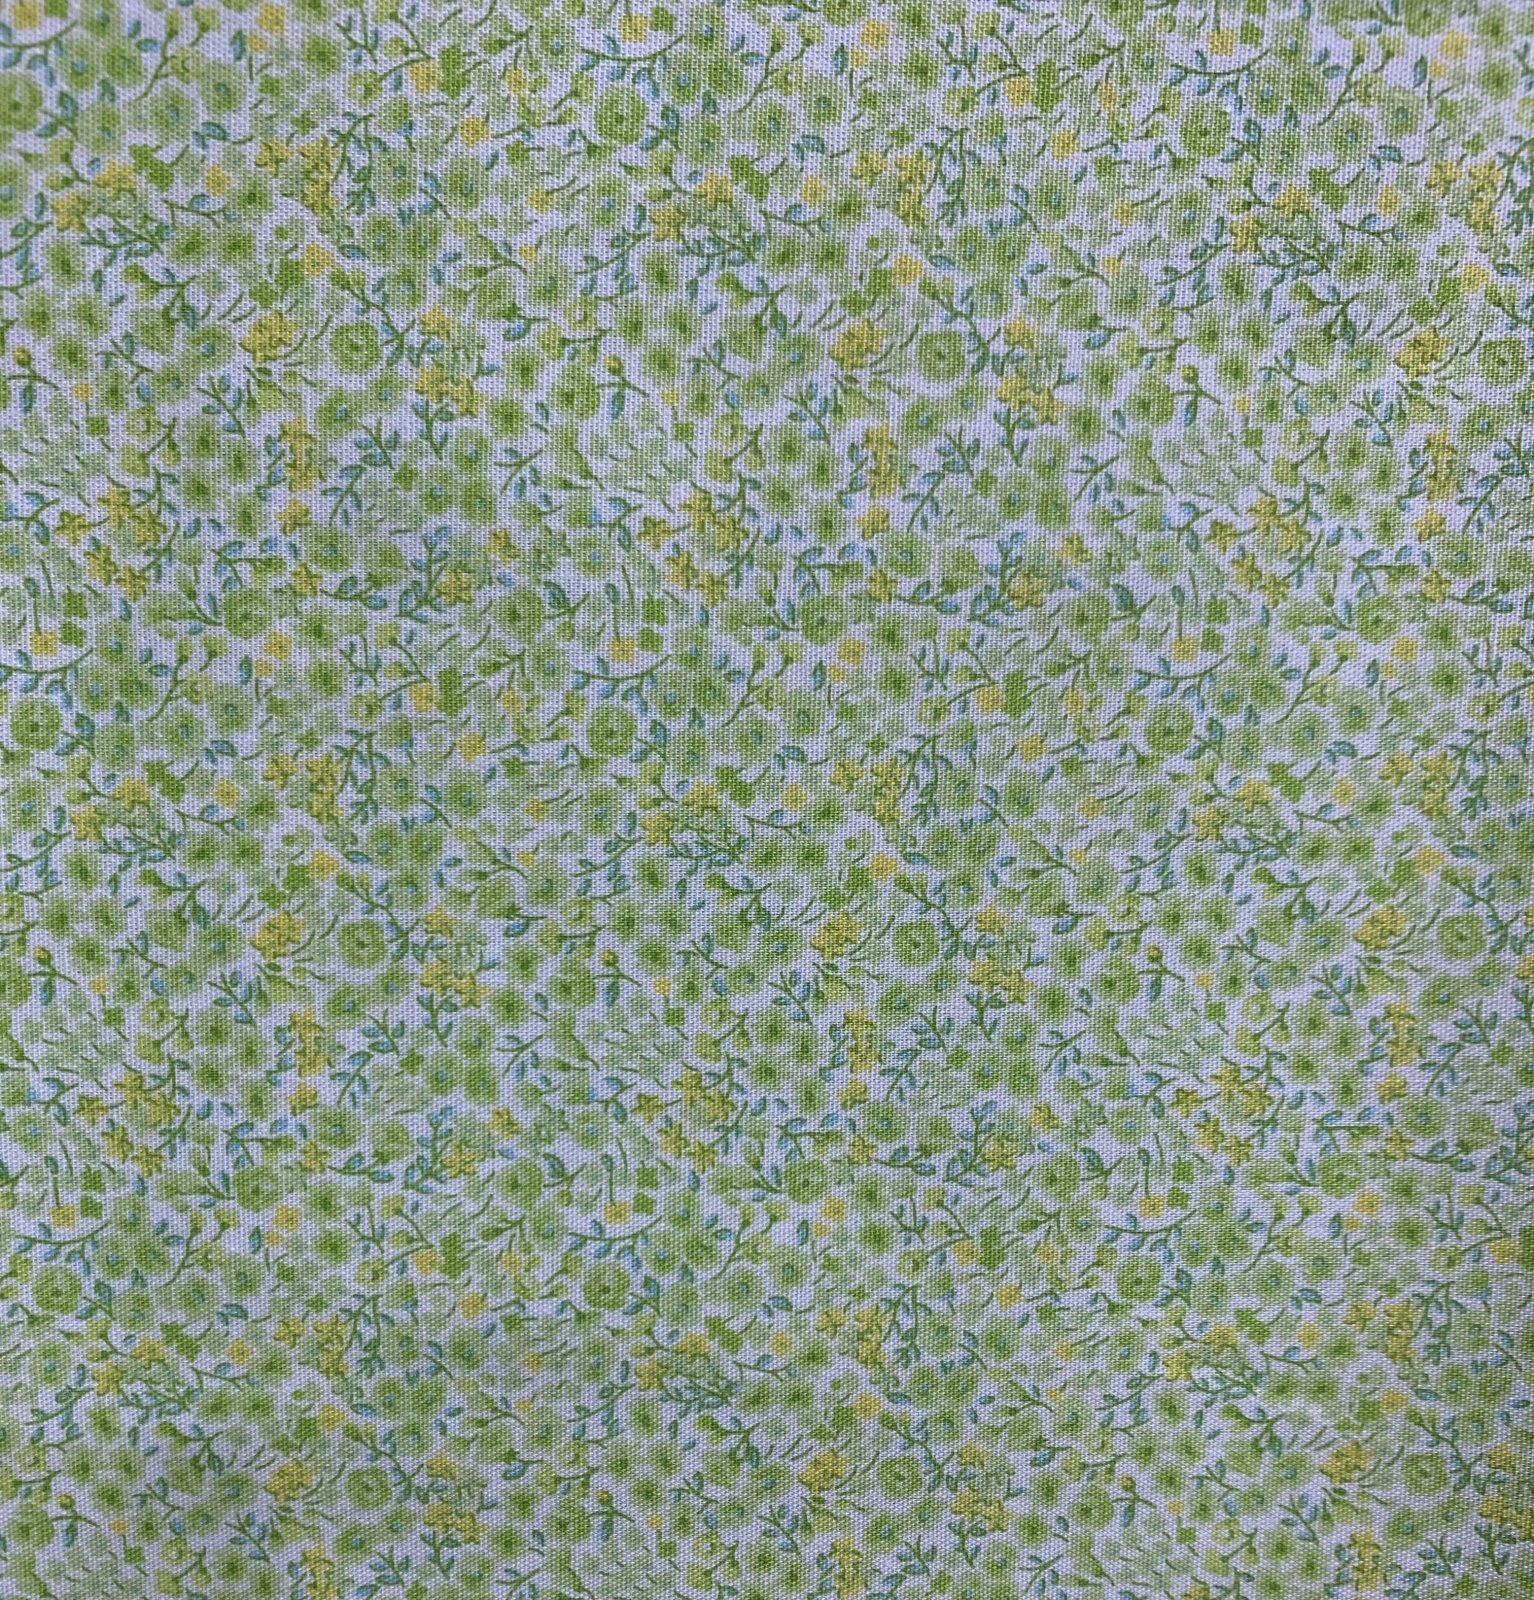 Japanese - Printed Poplin - Micro Ditsy Floral